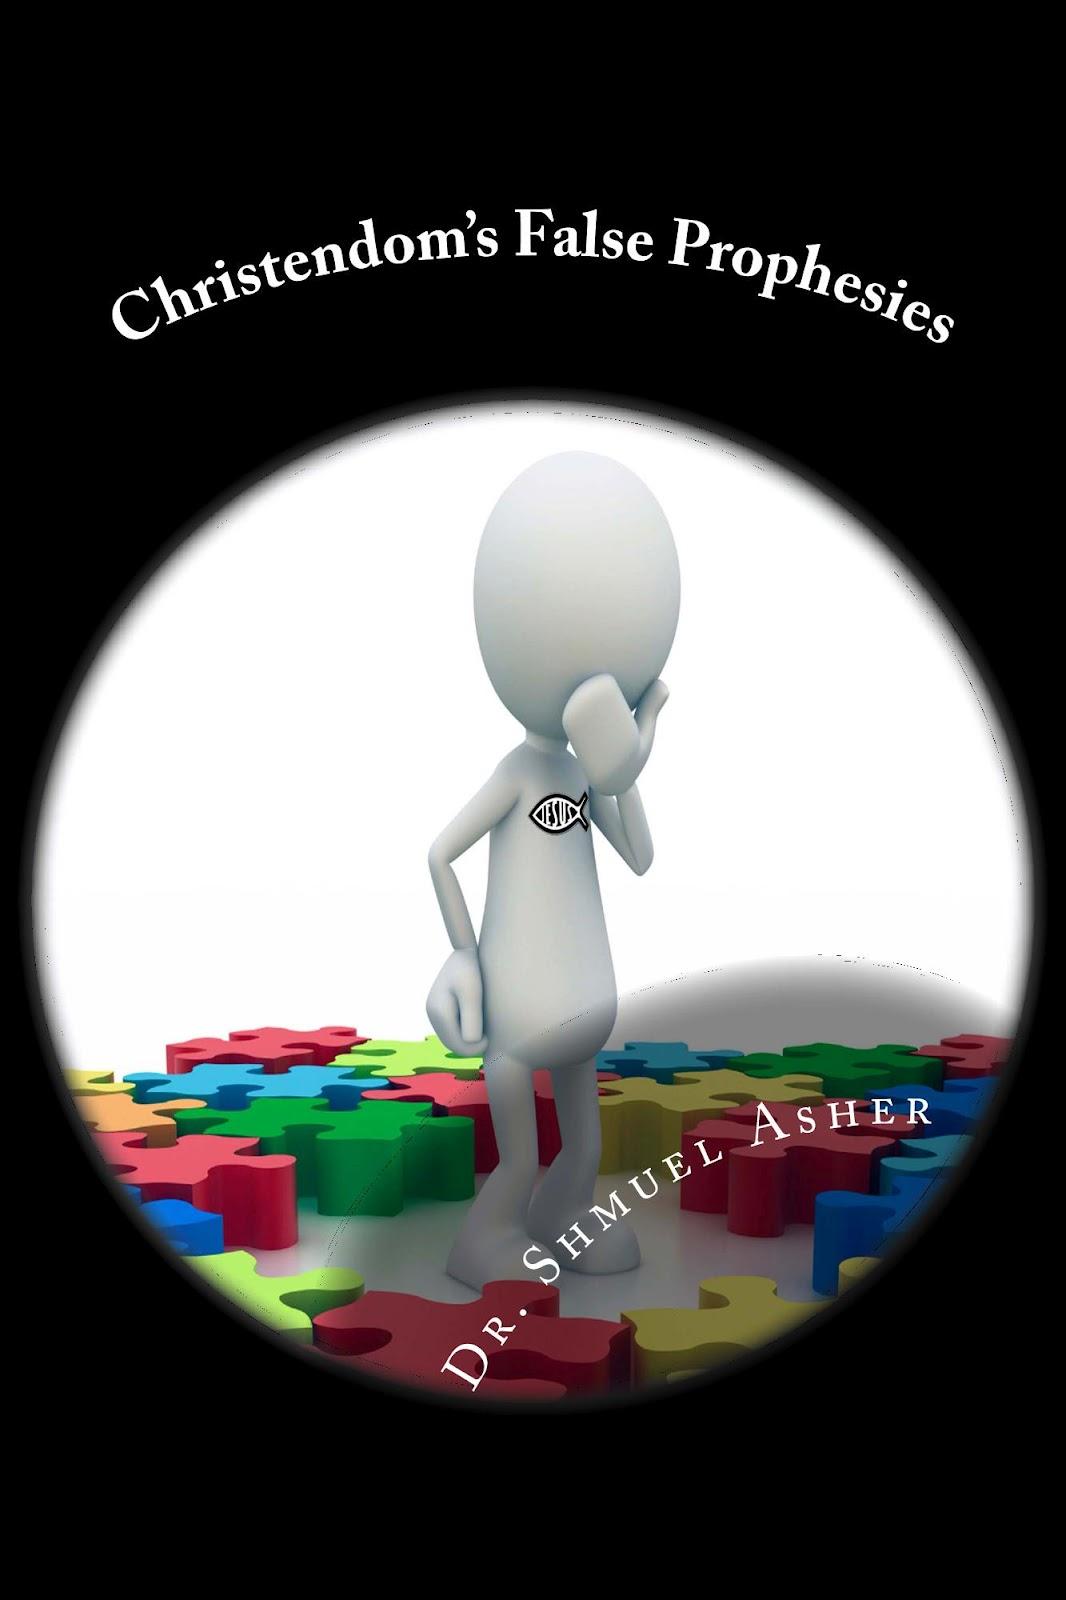 Christendoms' False Prophecies